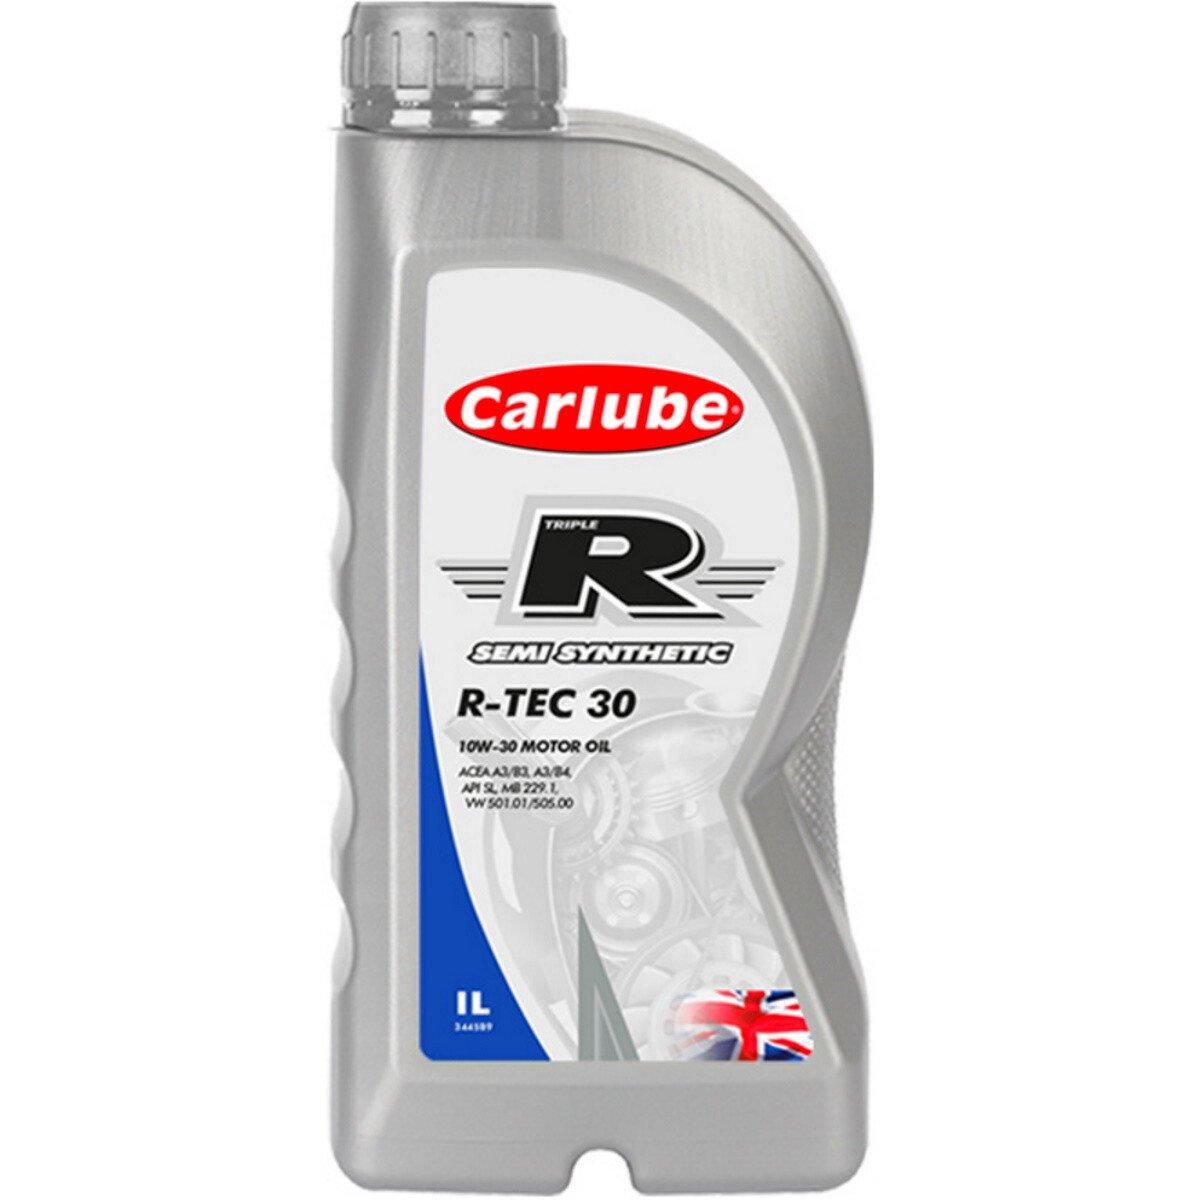 Tetrosyl KEB001 Carlube Triple R 10W-30 R-Tec 30 Semi Synthetic Motor Oil 1L